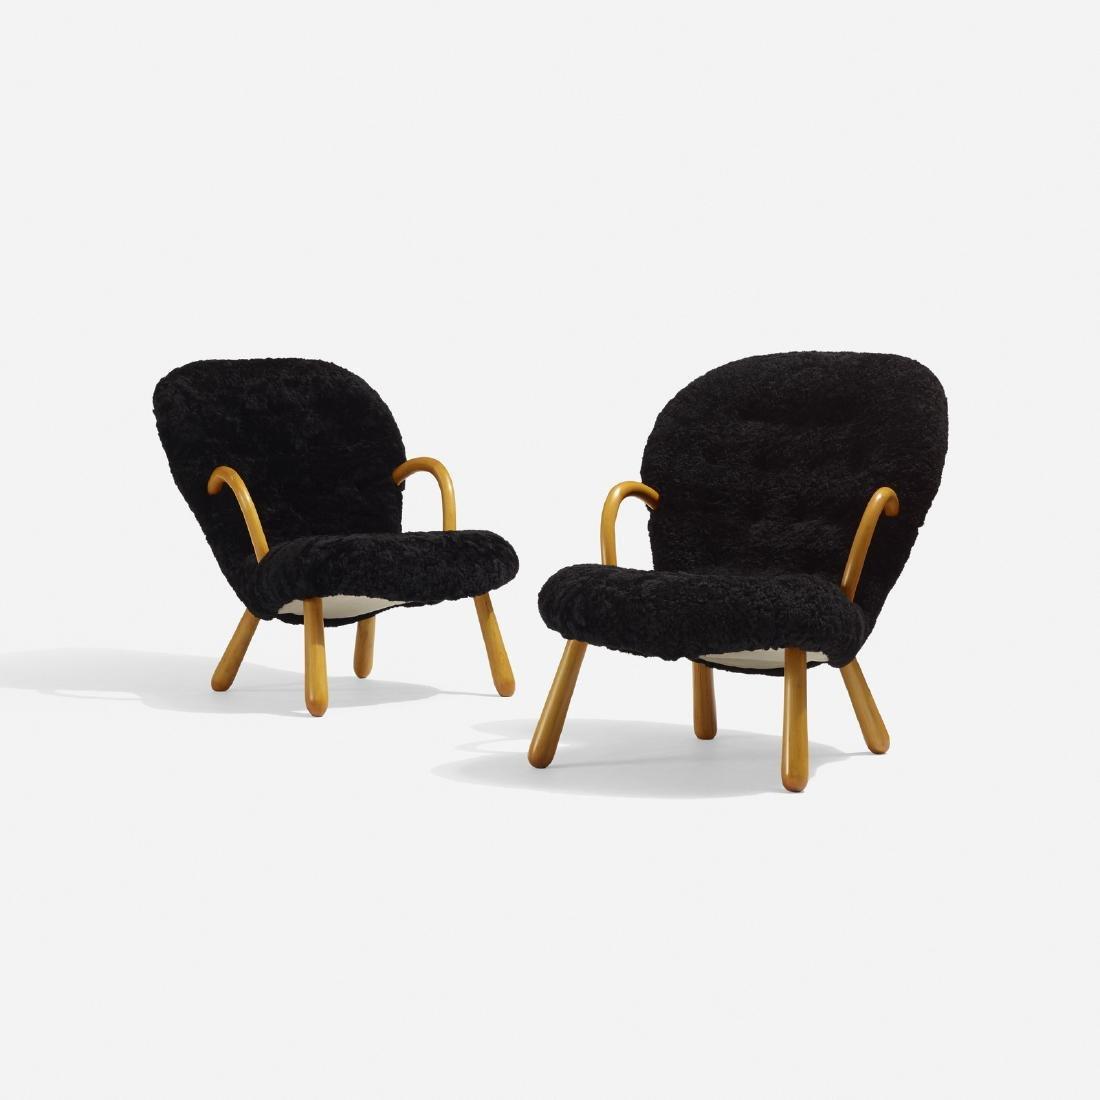 Philip Arctander, lounge chairs, pair